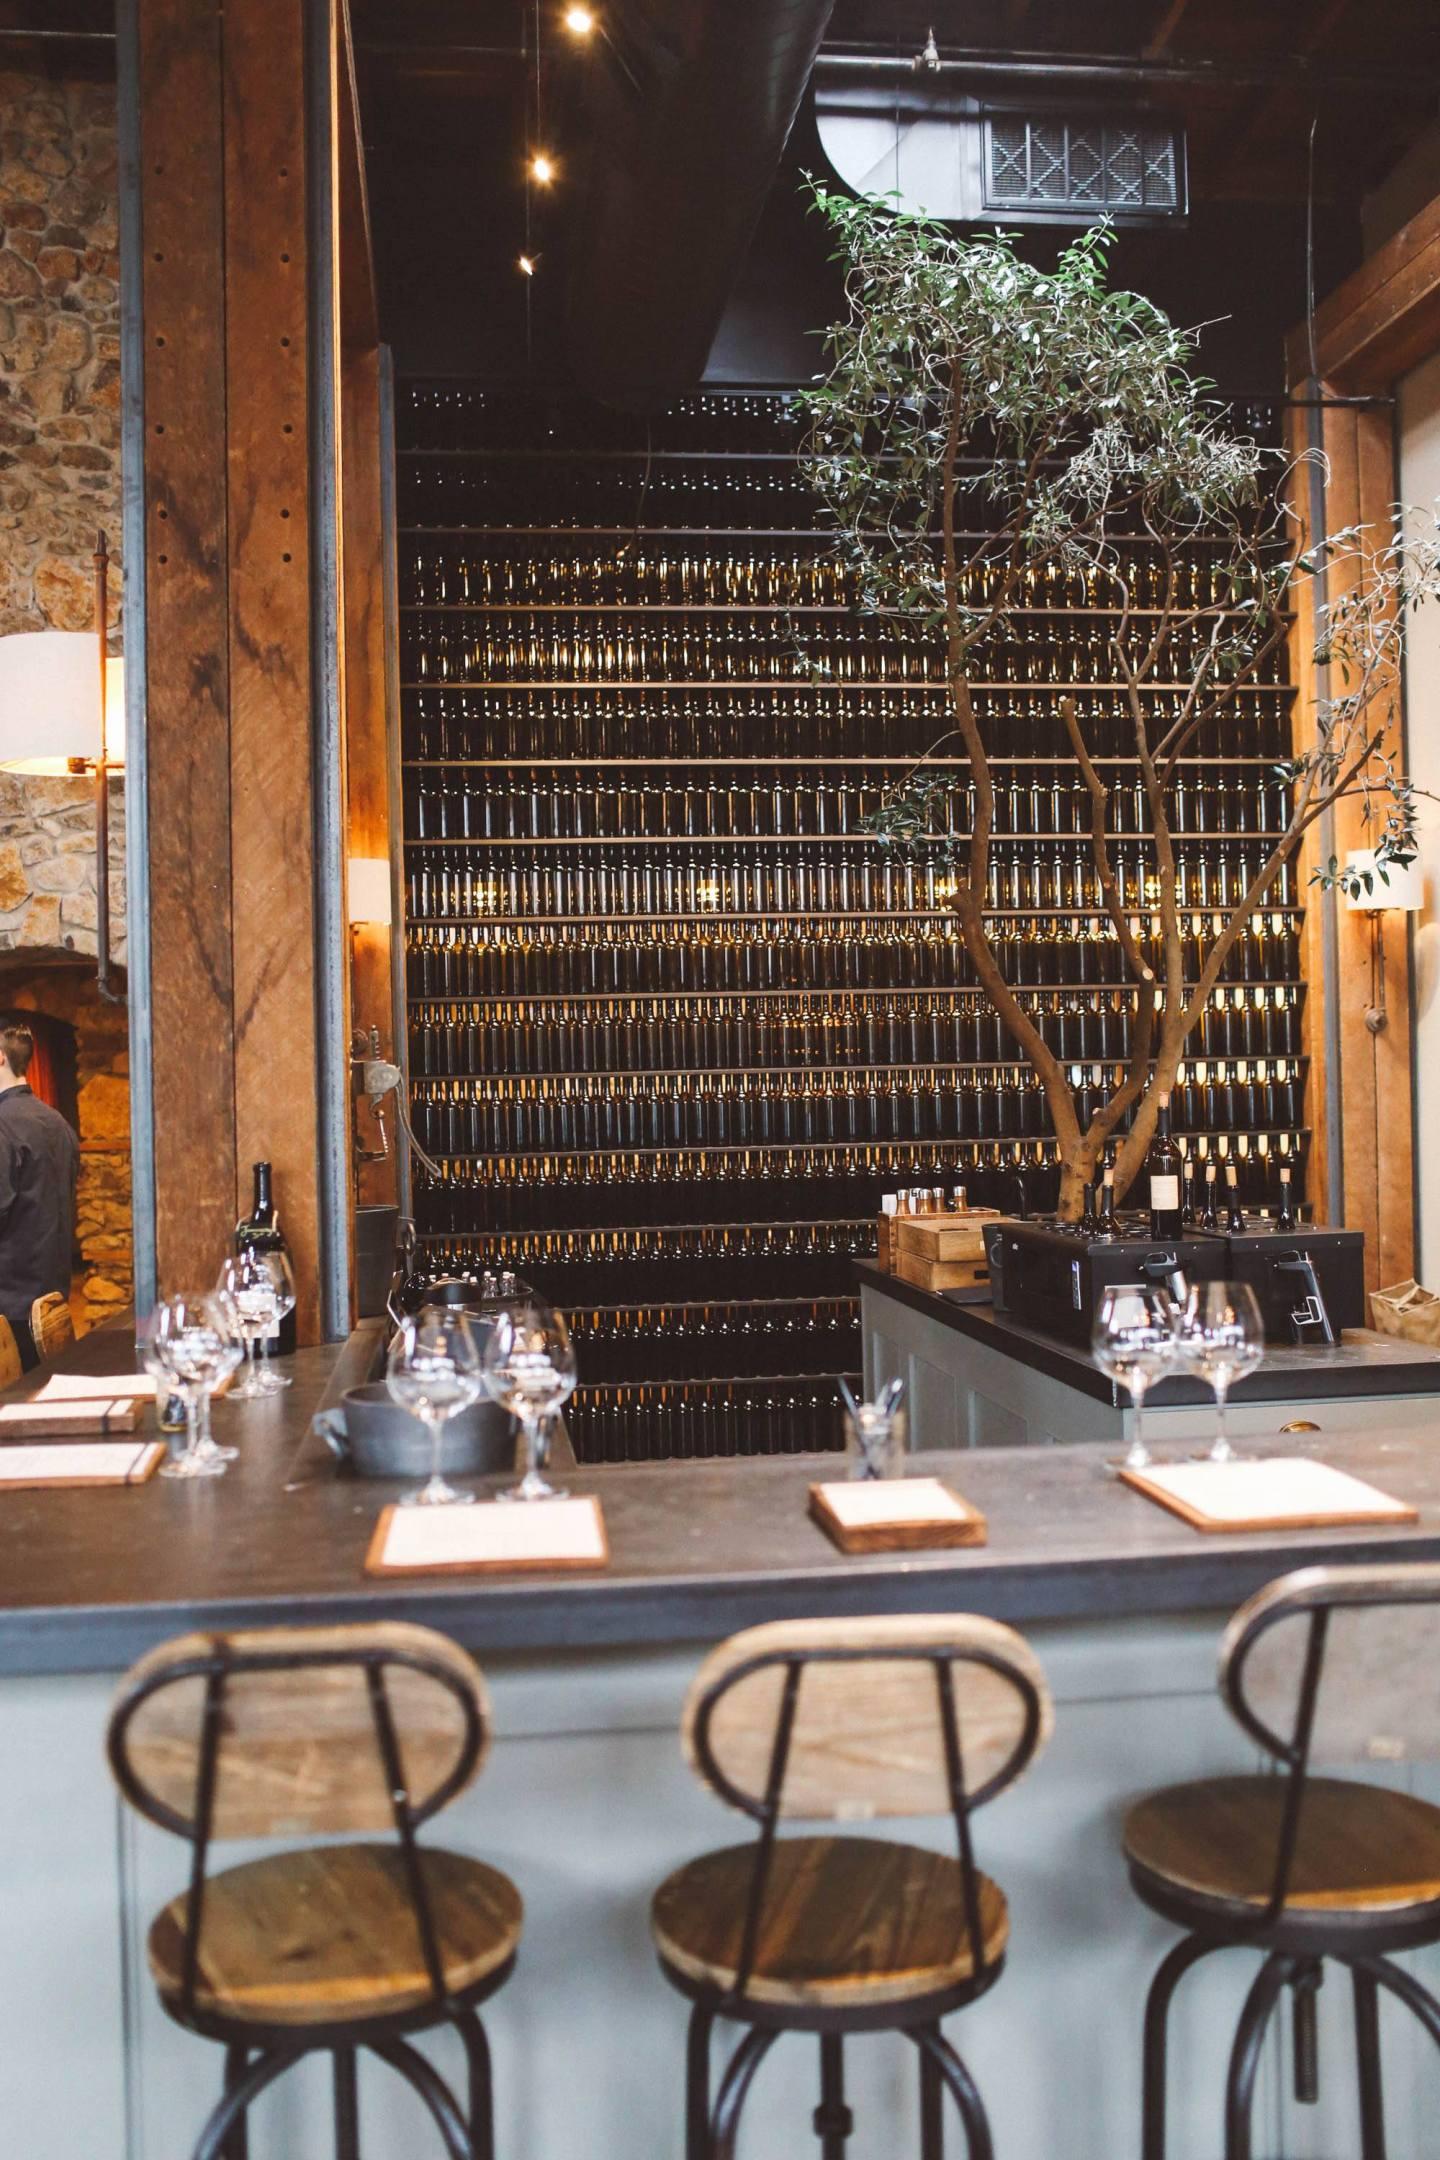 pangloss cellars sonoma wine tasting